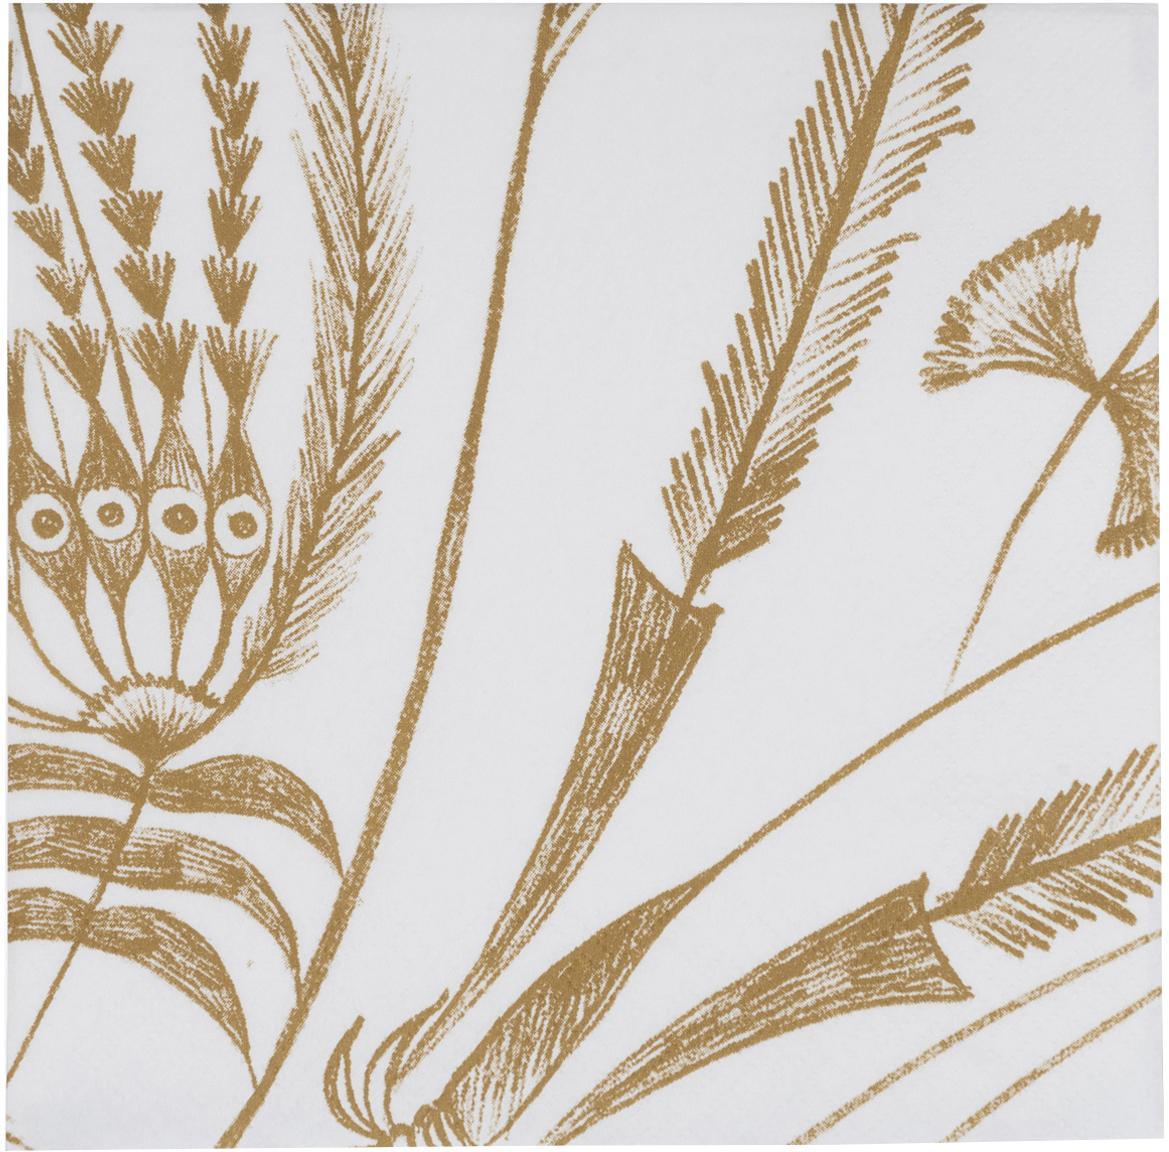 Papieren servetten Bukit Jambul, 12 stuks, Papier, Wit, bruin, 33 x 33 cm